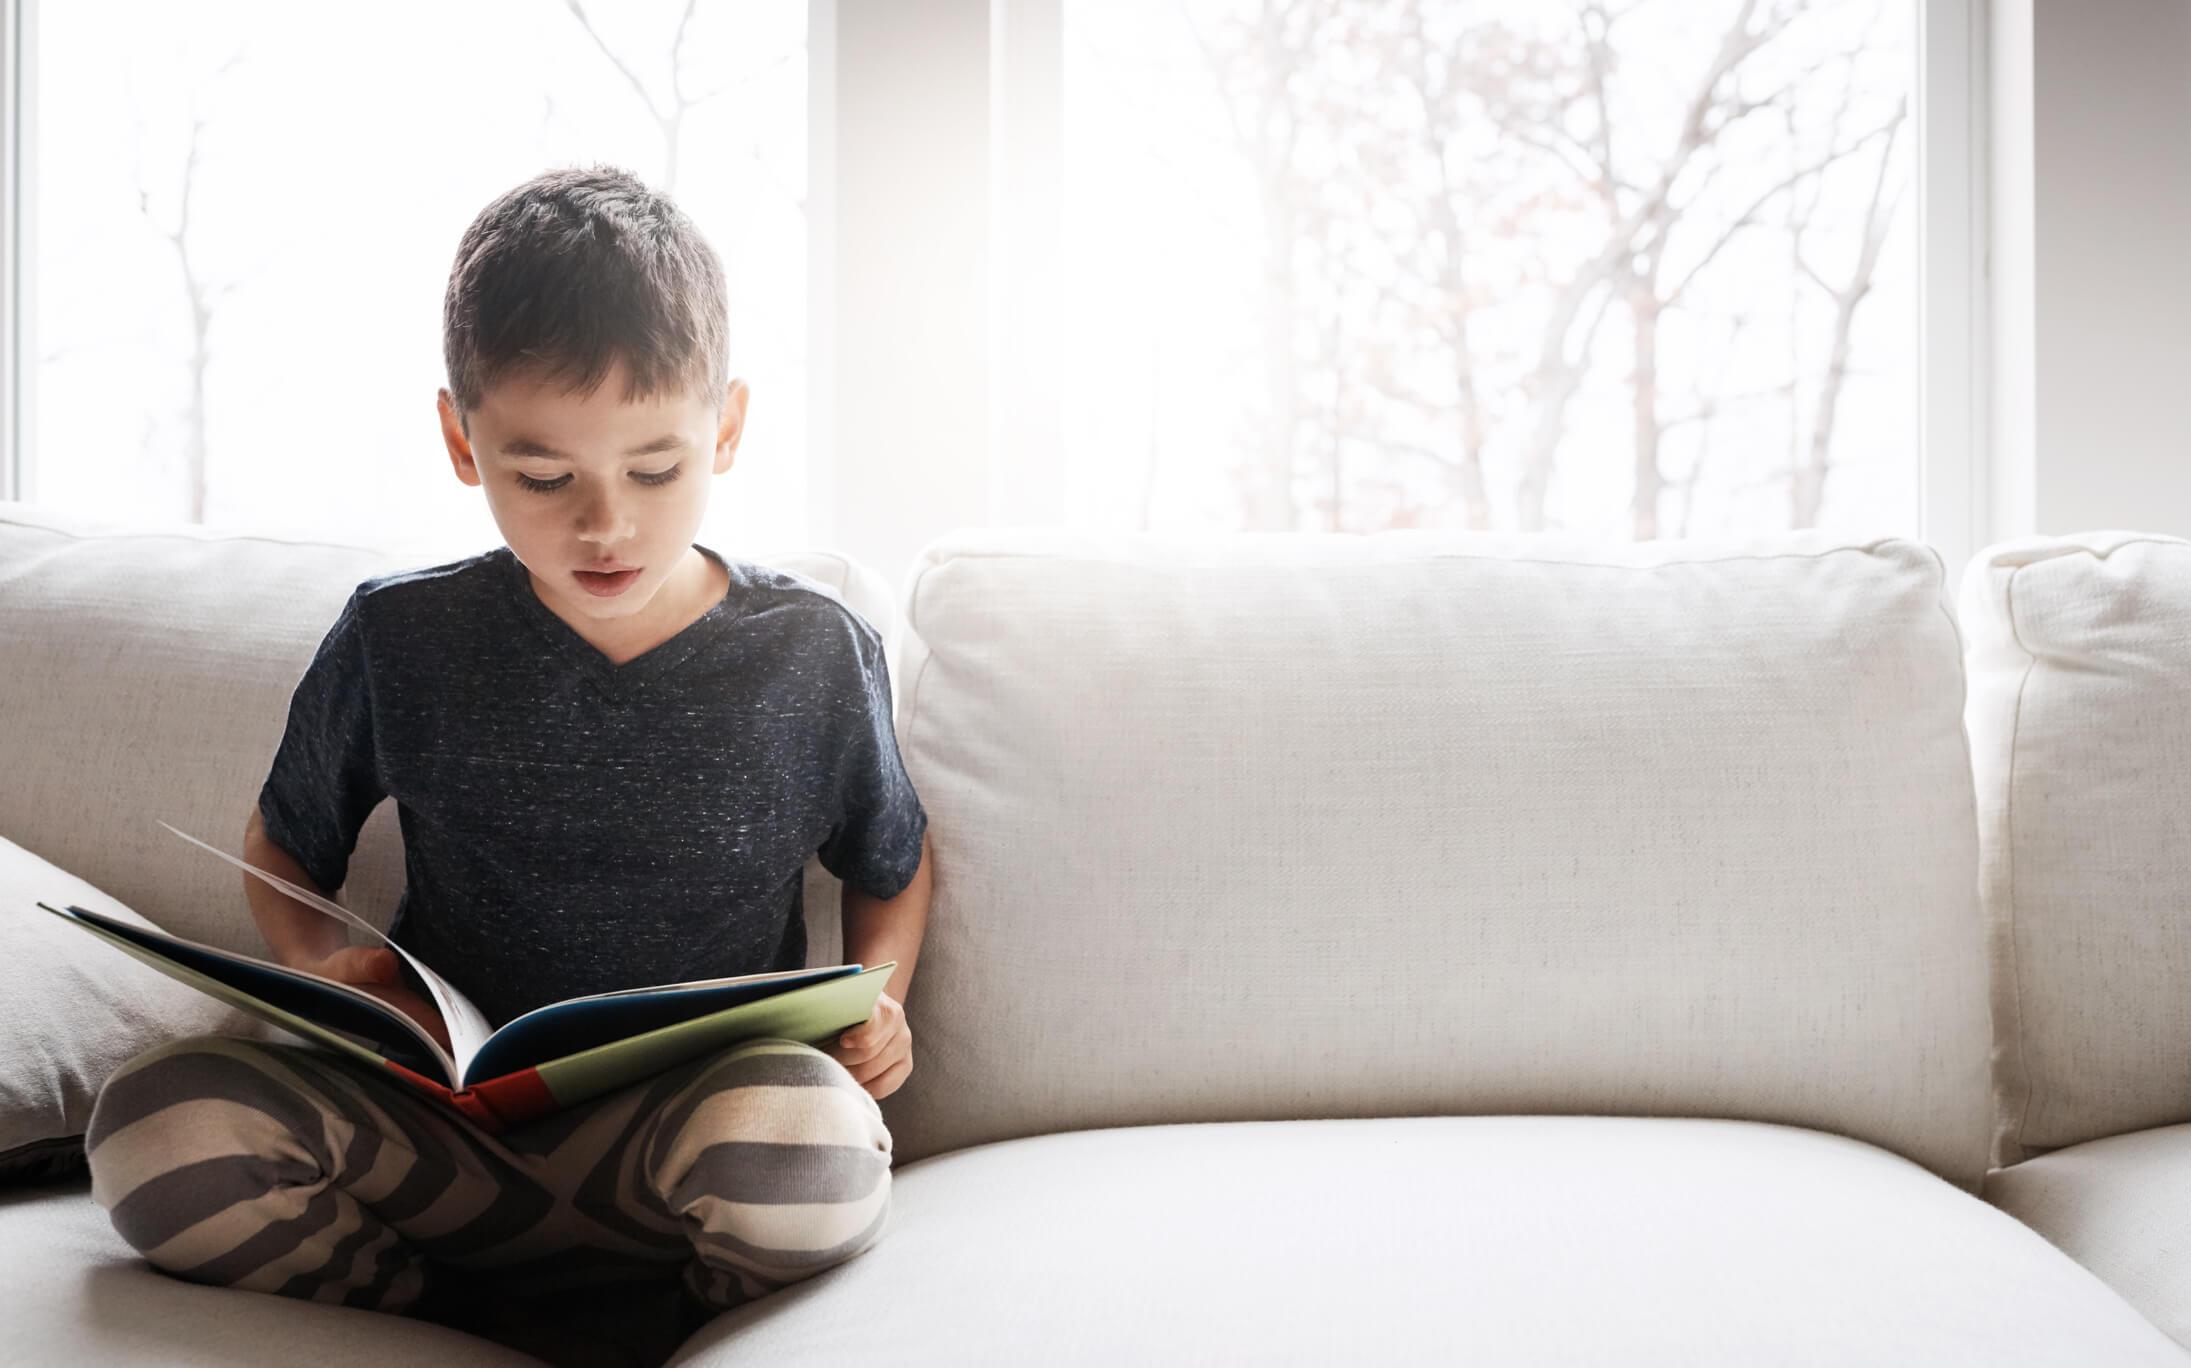 dificuldade de leitura